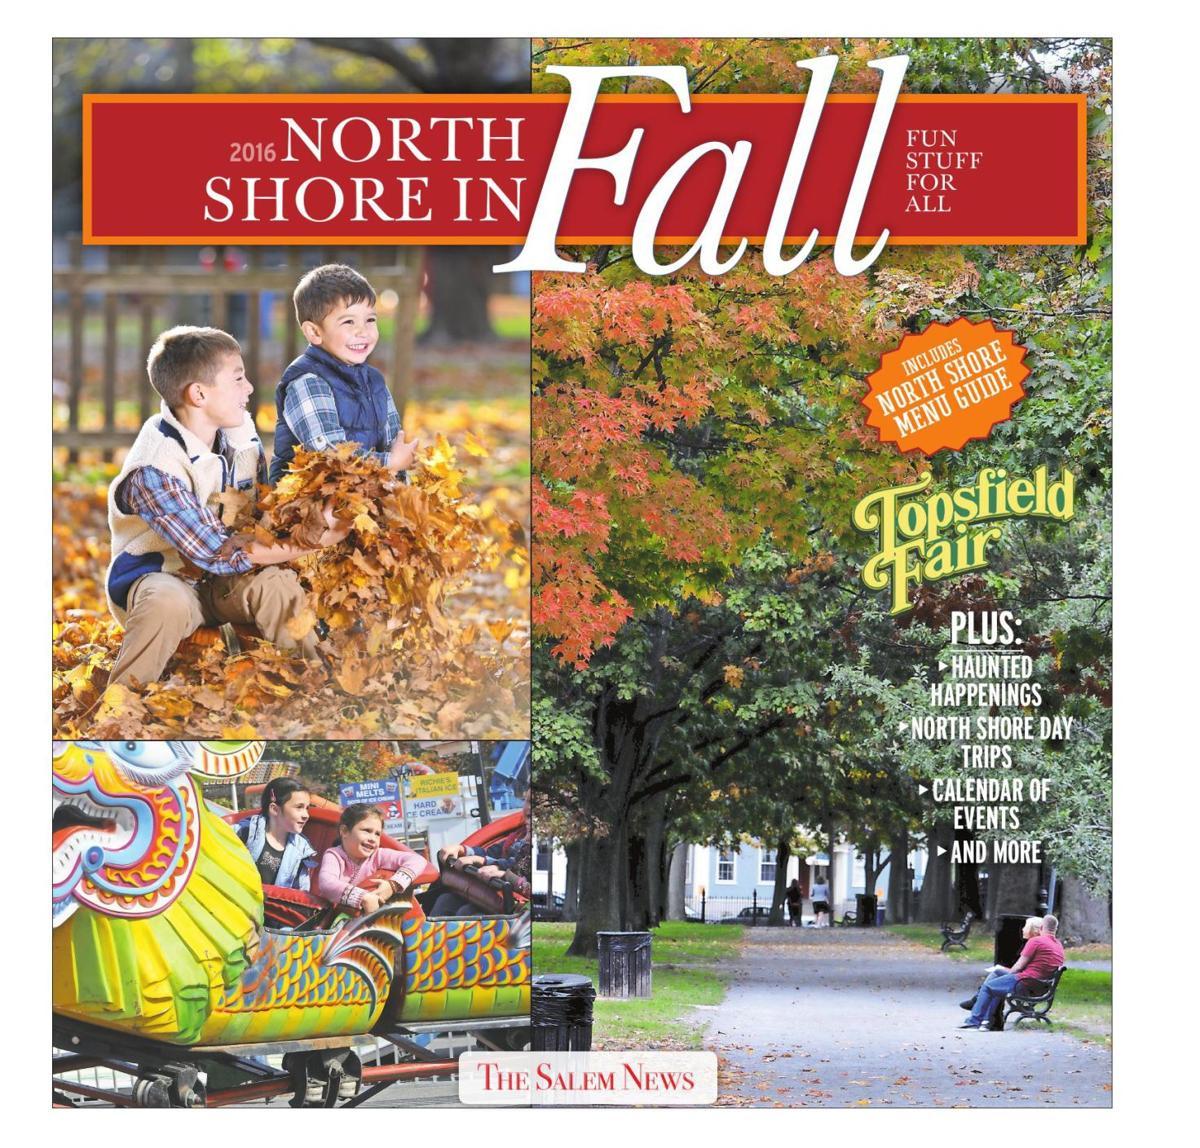 North Shore in Fall 2016